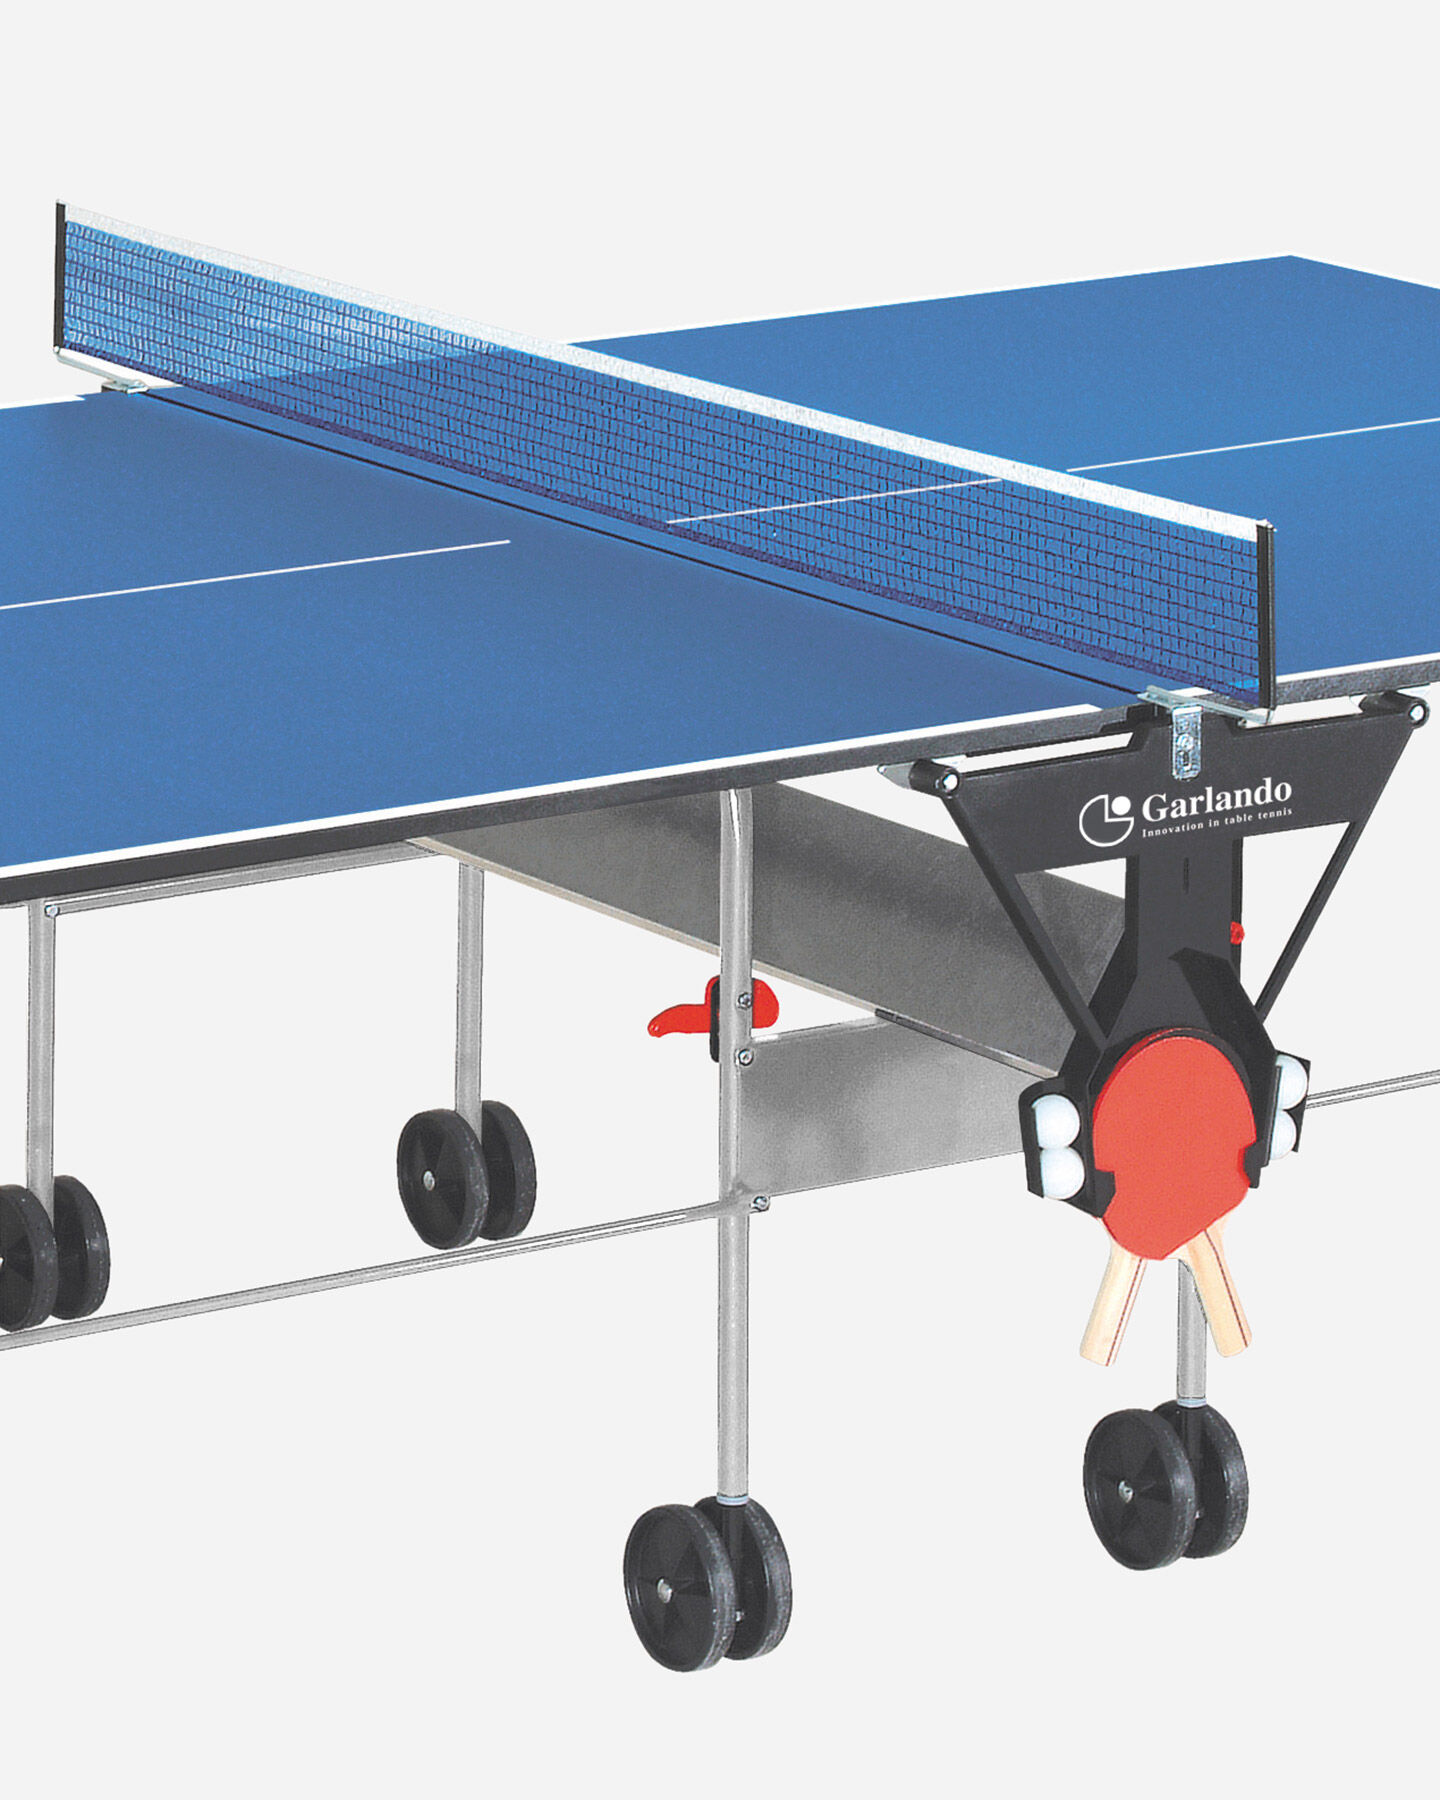 Tavolo ping pong GARLANDO TRAINING INDOOR S1251232|N.D.|UNI scatto 1